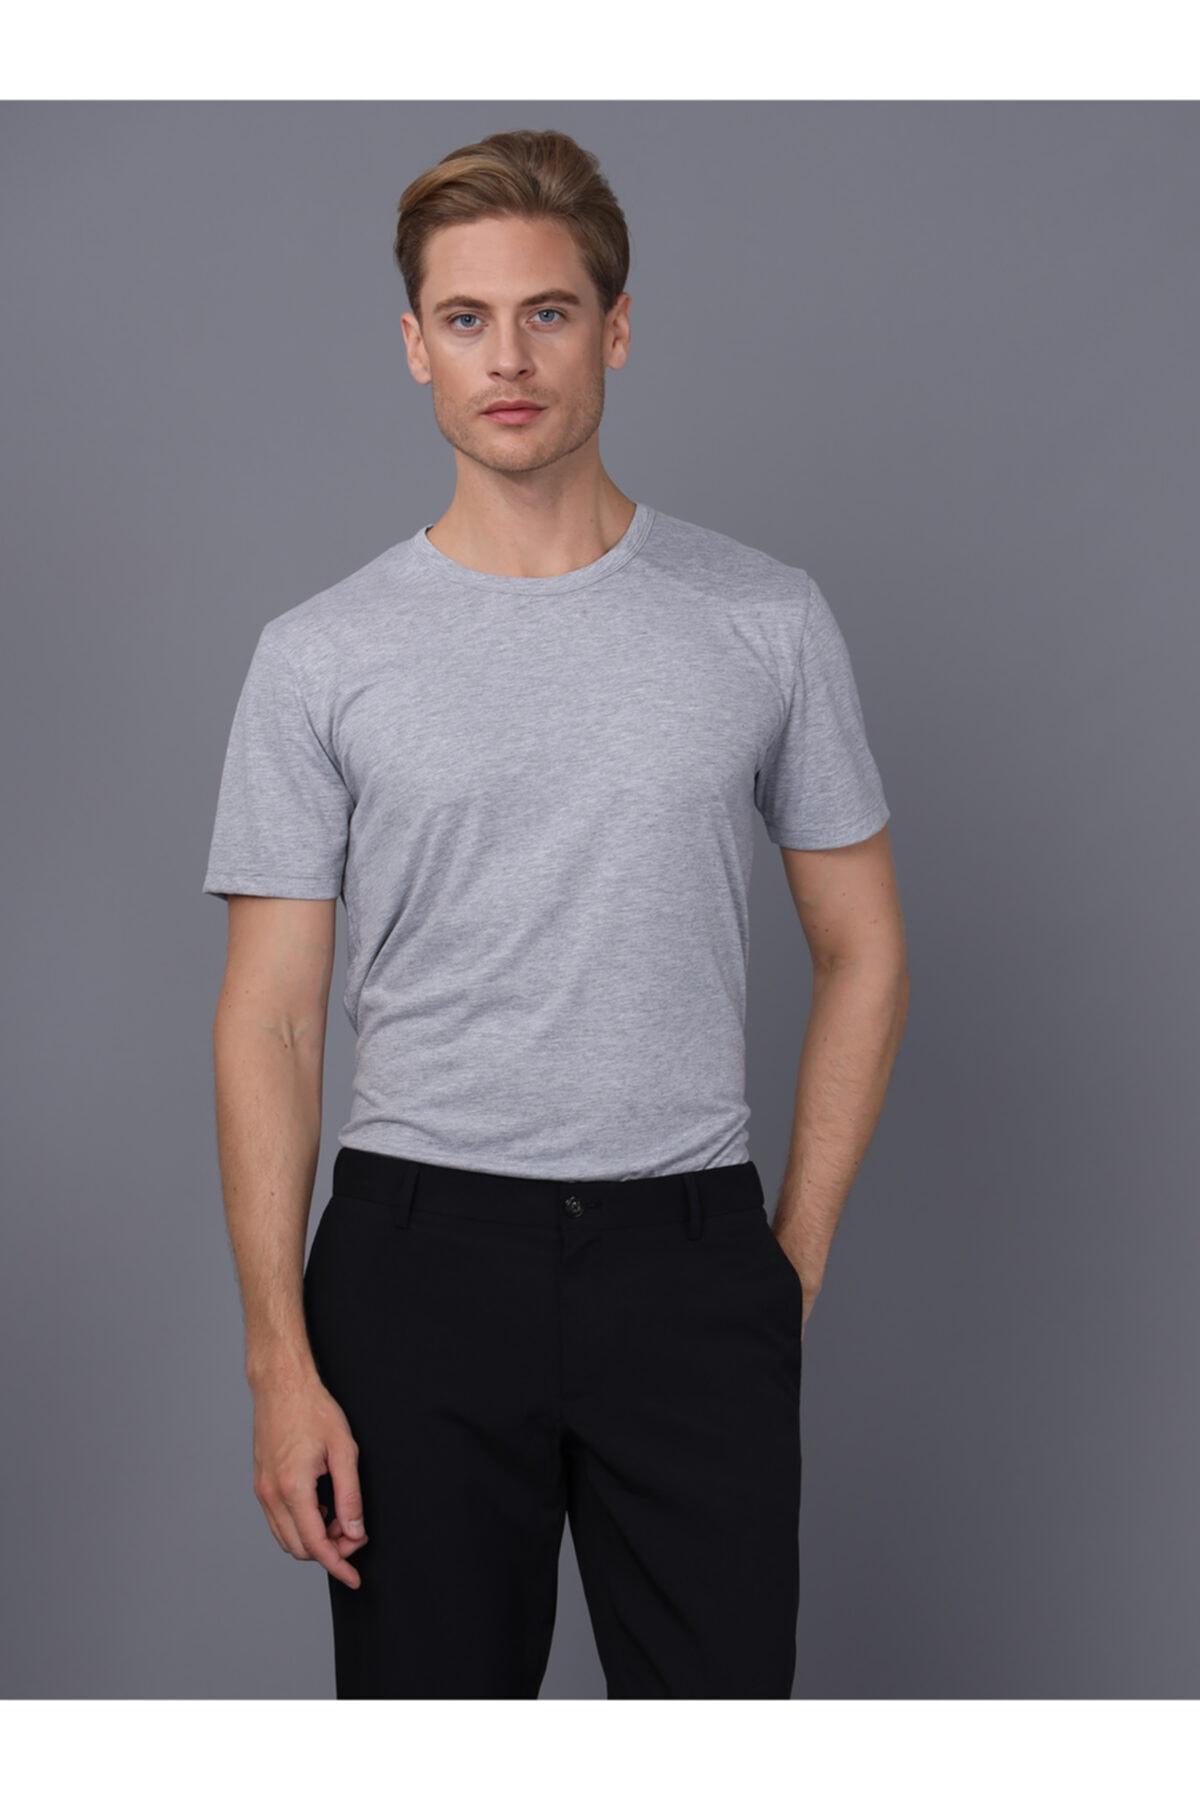 Basics&More Erkek Gri Bisiklet Yaka T-Shirt 1